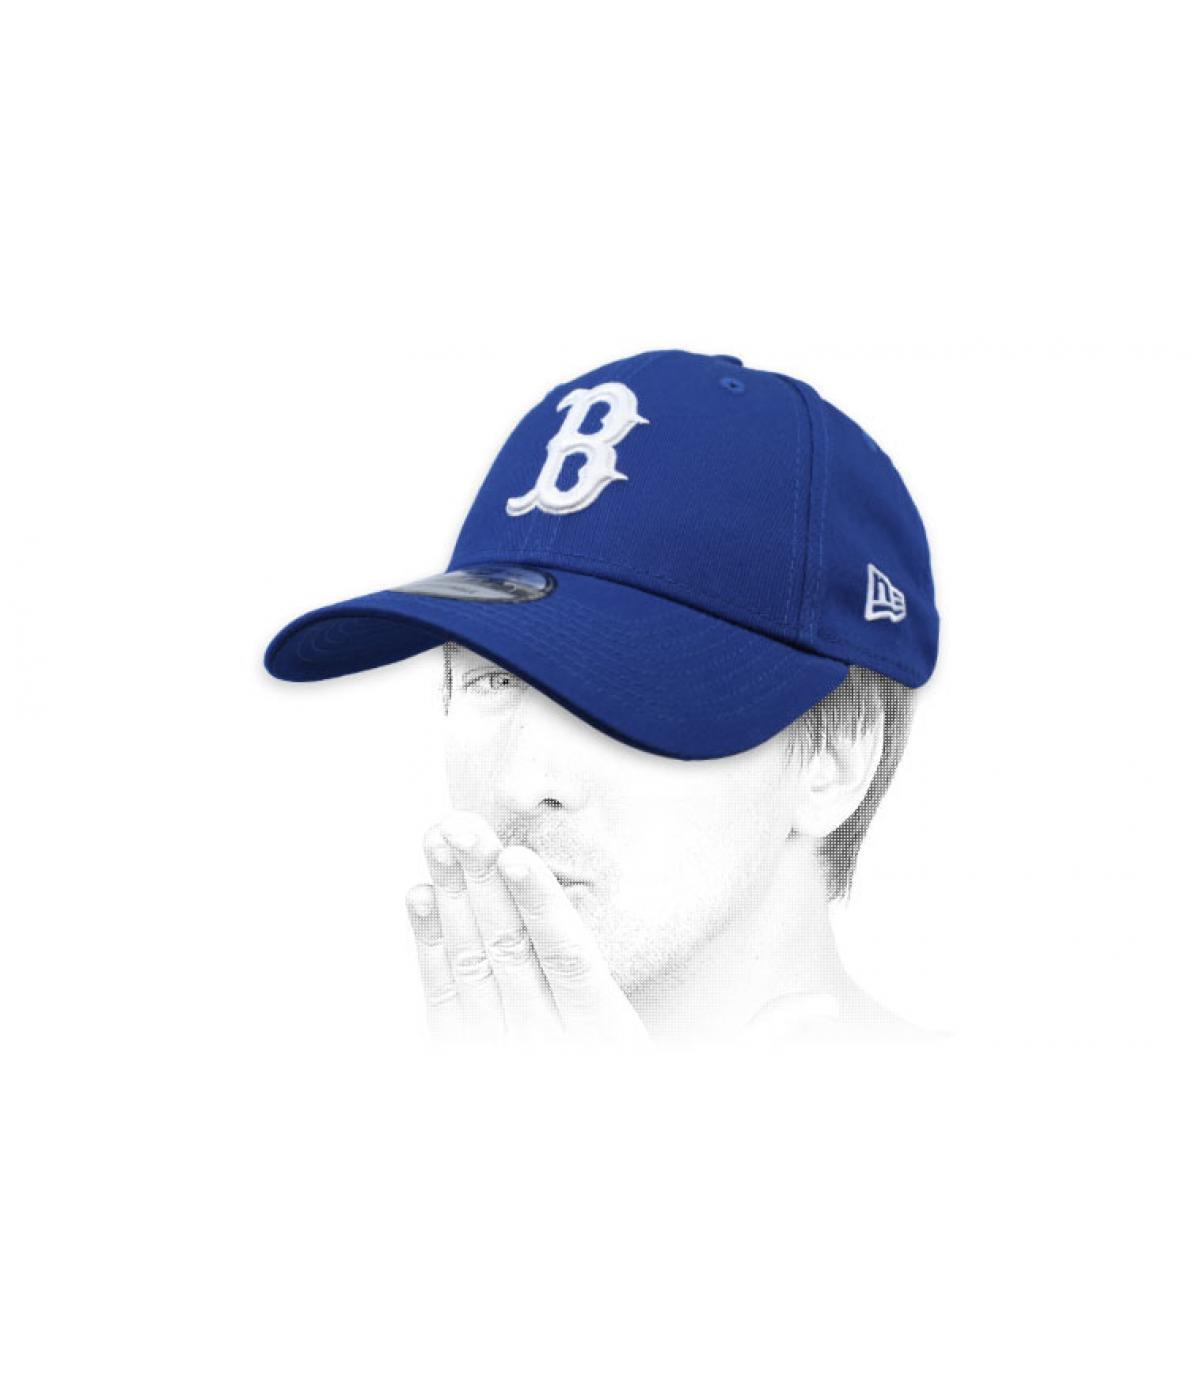 gorra B azul